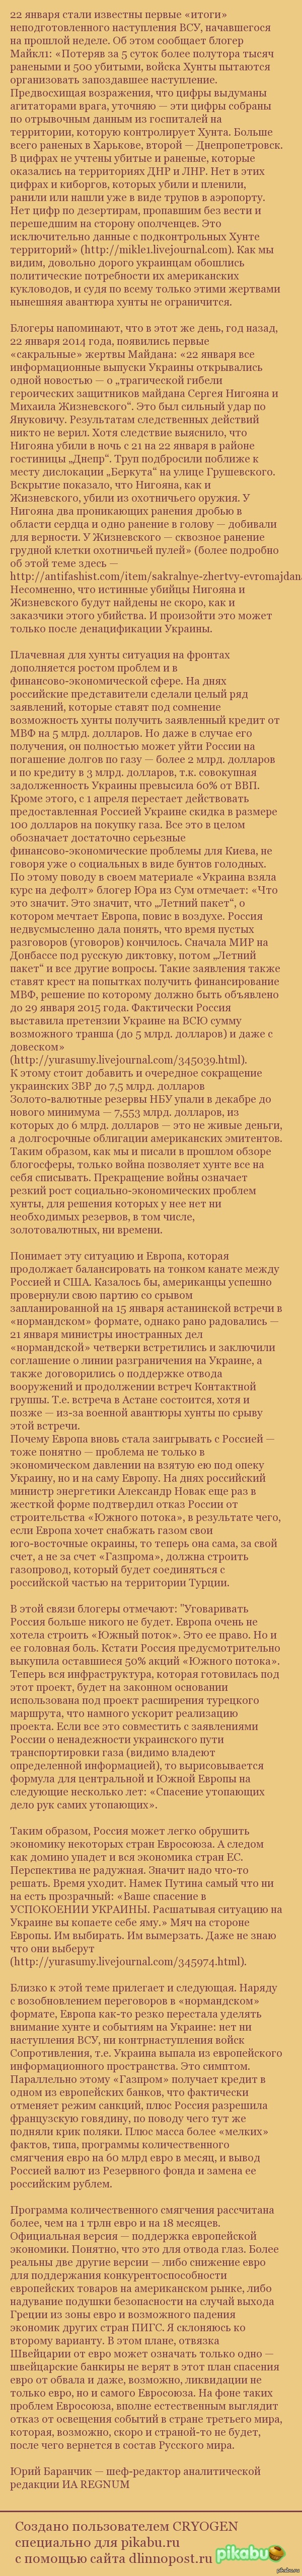 Хунту бьют по всем направлениям. взято с http://www.regnum.ru/news/polit/1887392.html